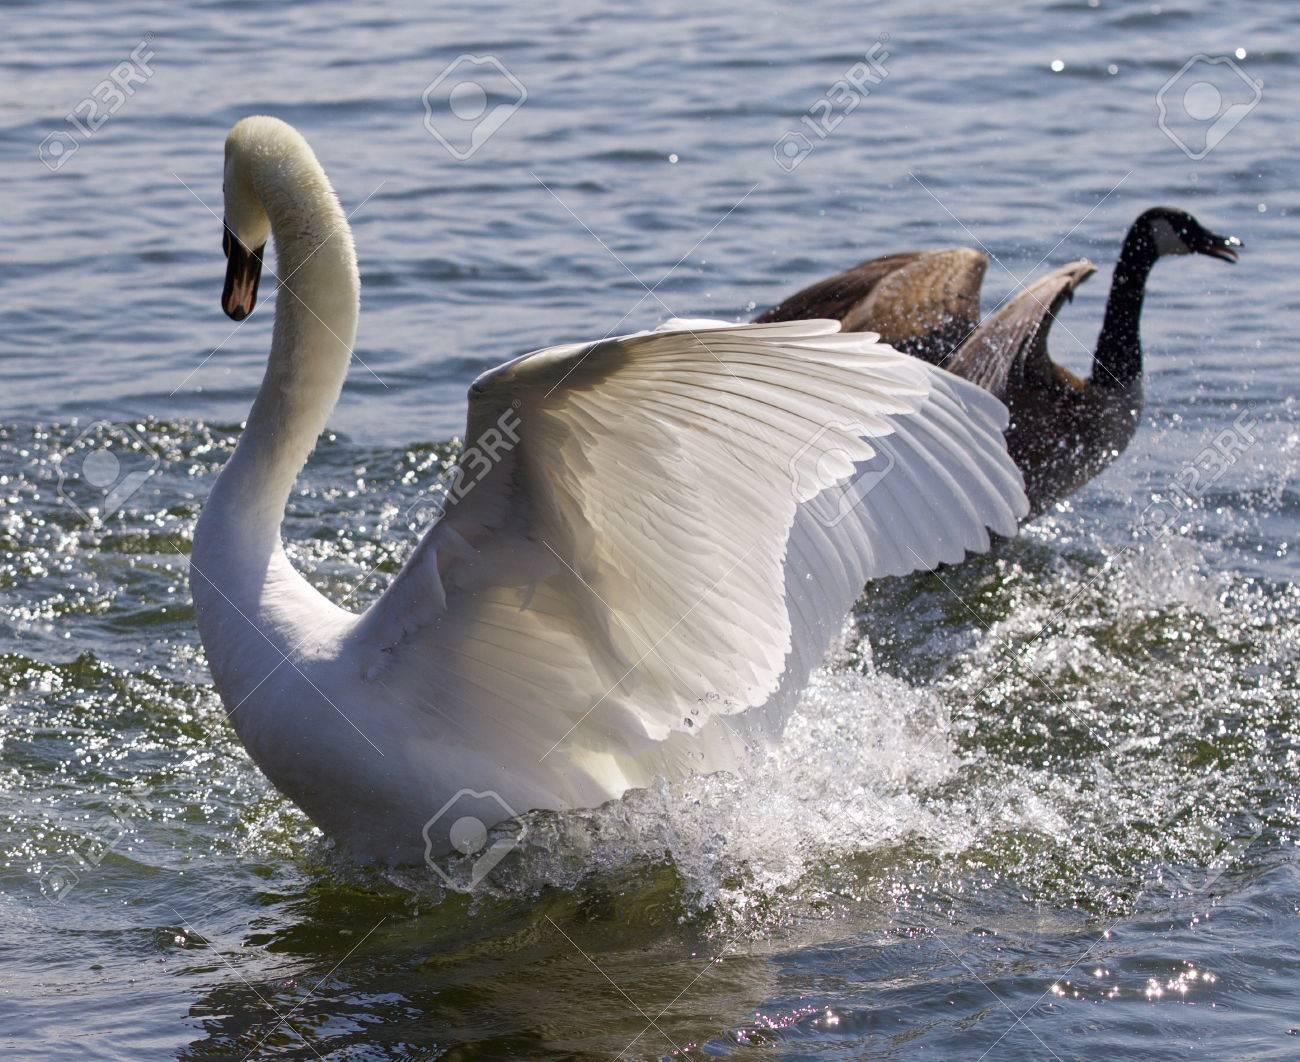 Fantastic contest between the powerful swan and the brave canada fantastic contest between the powerful swan and the brave canada goose stock photo 62966199 biocorpaavc Gallery